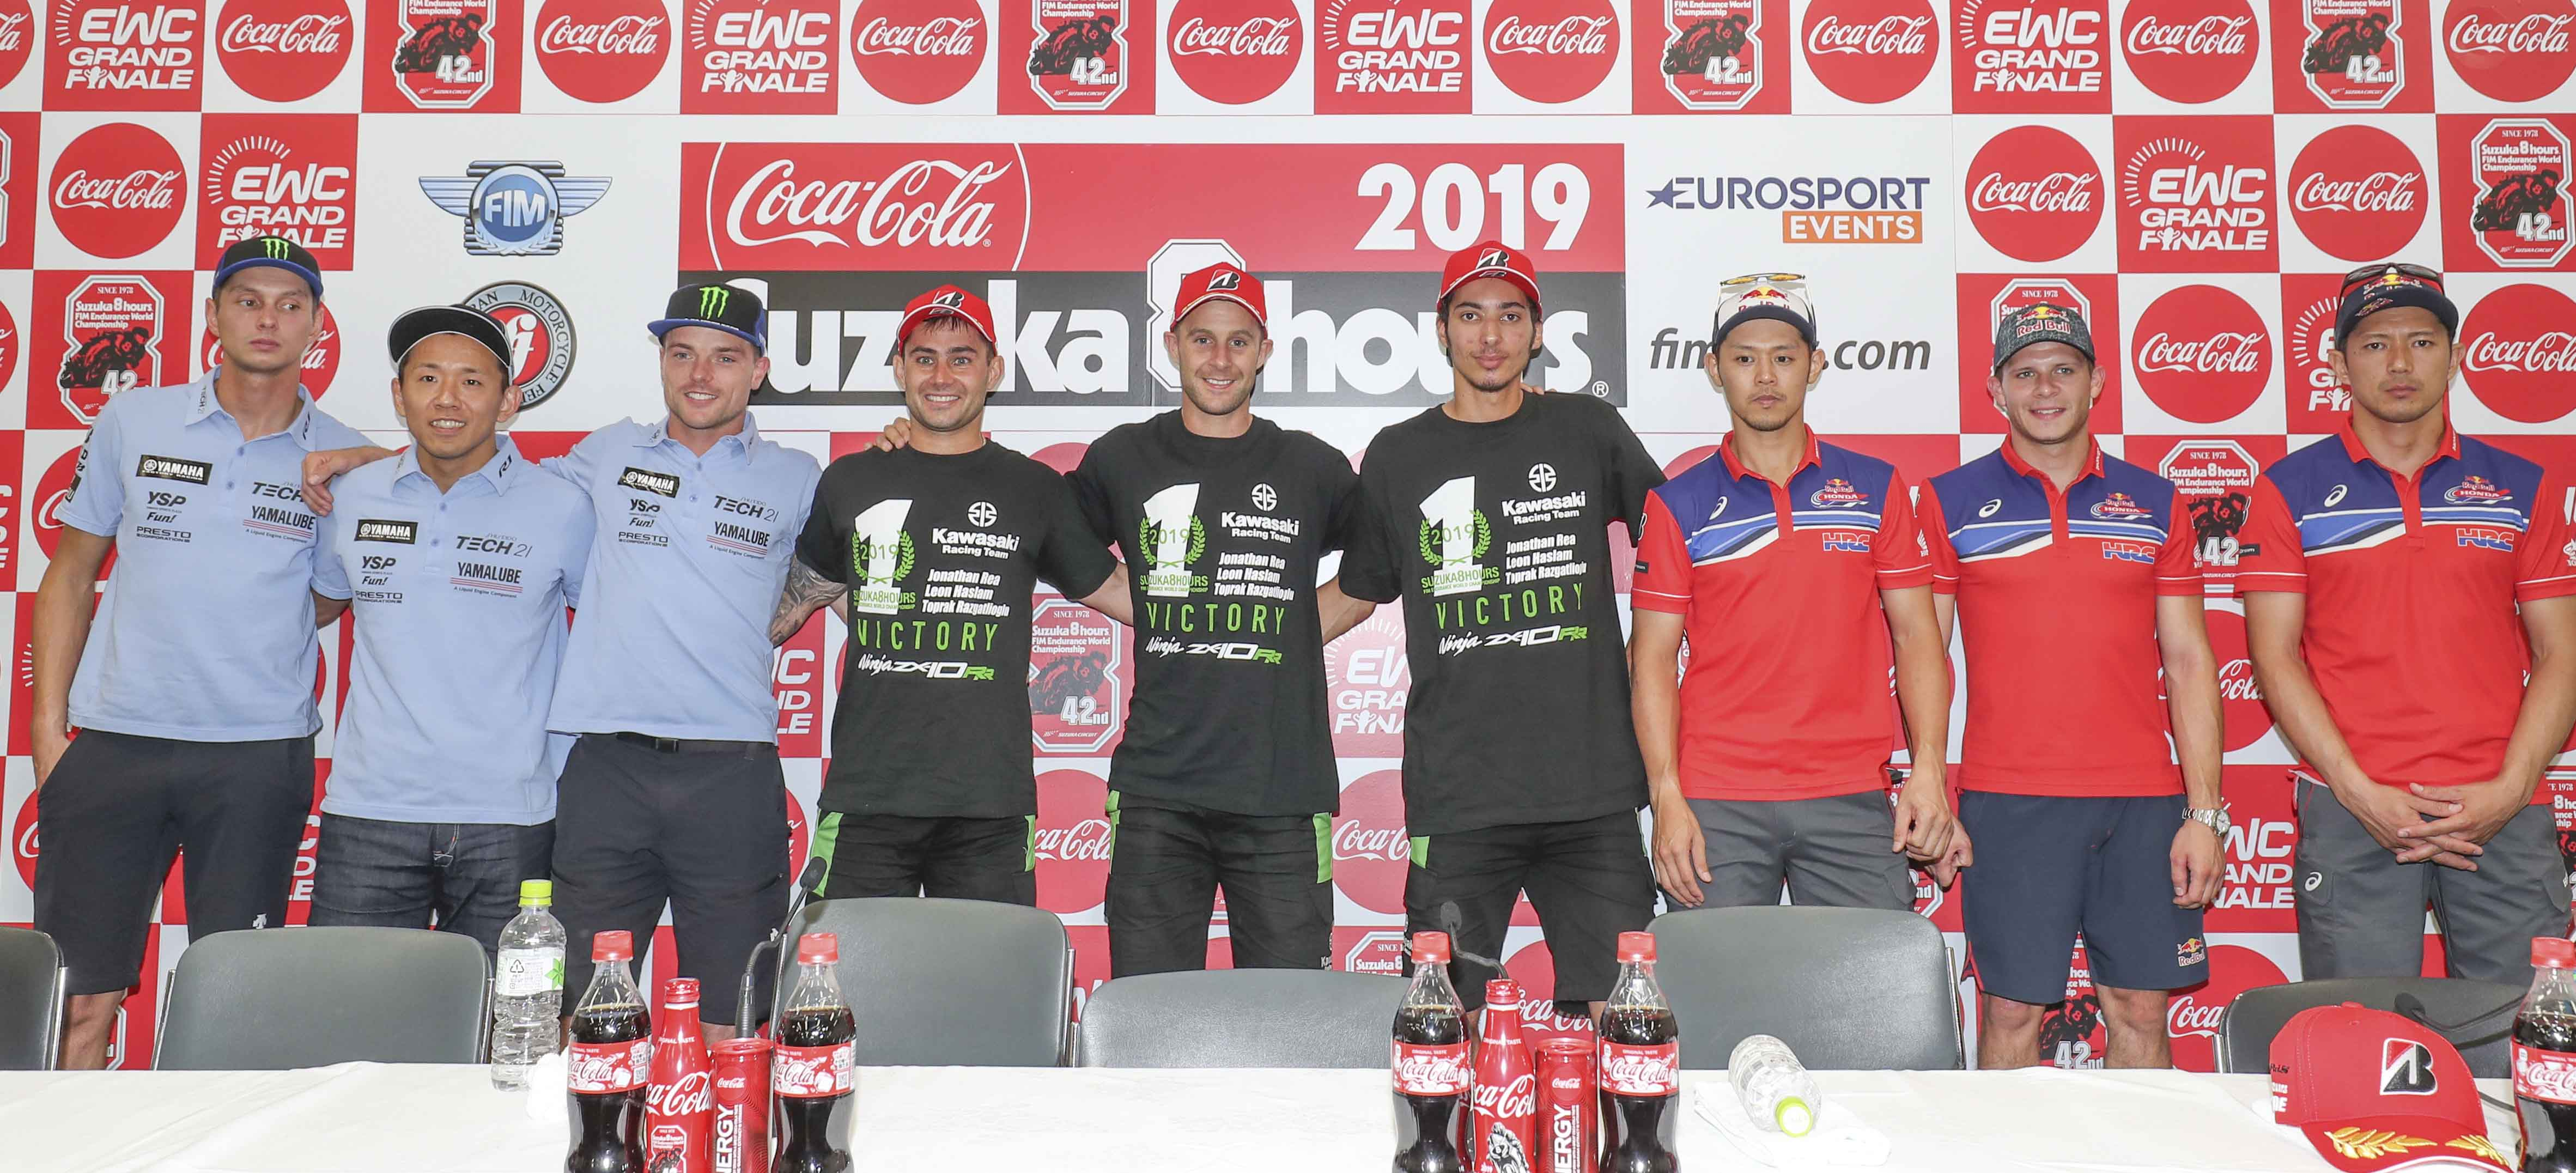 Victoire du Kawasaki Racing Team à Suzuka  – 1er titre mondial pour le Team SRC Kawasaki France